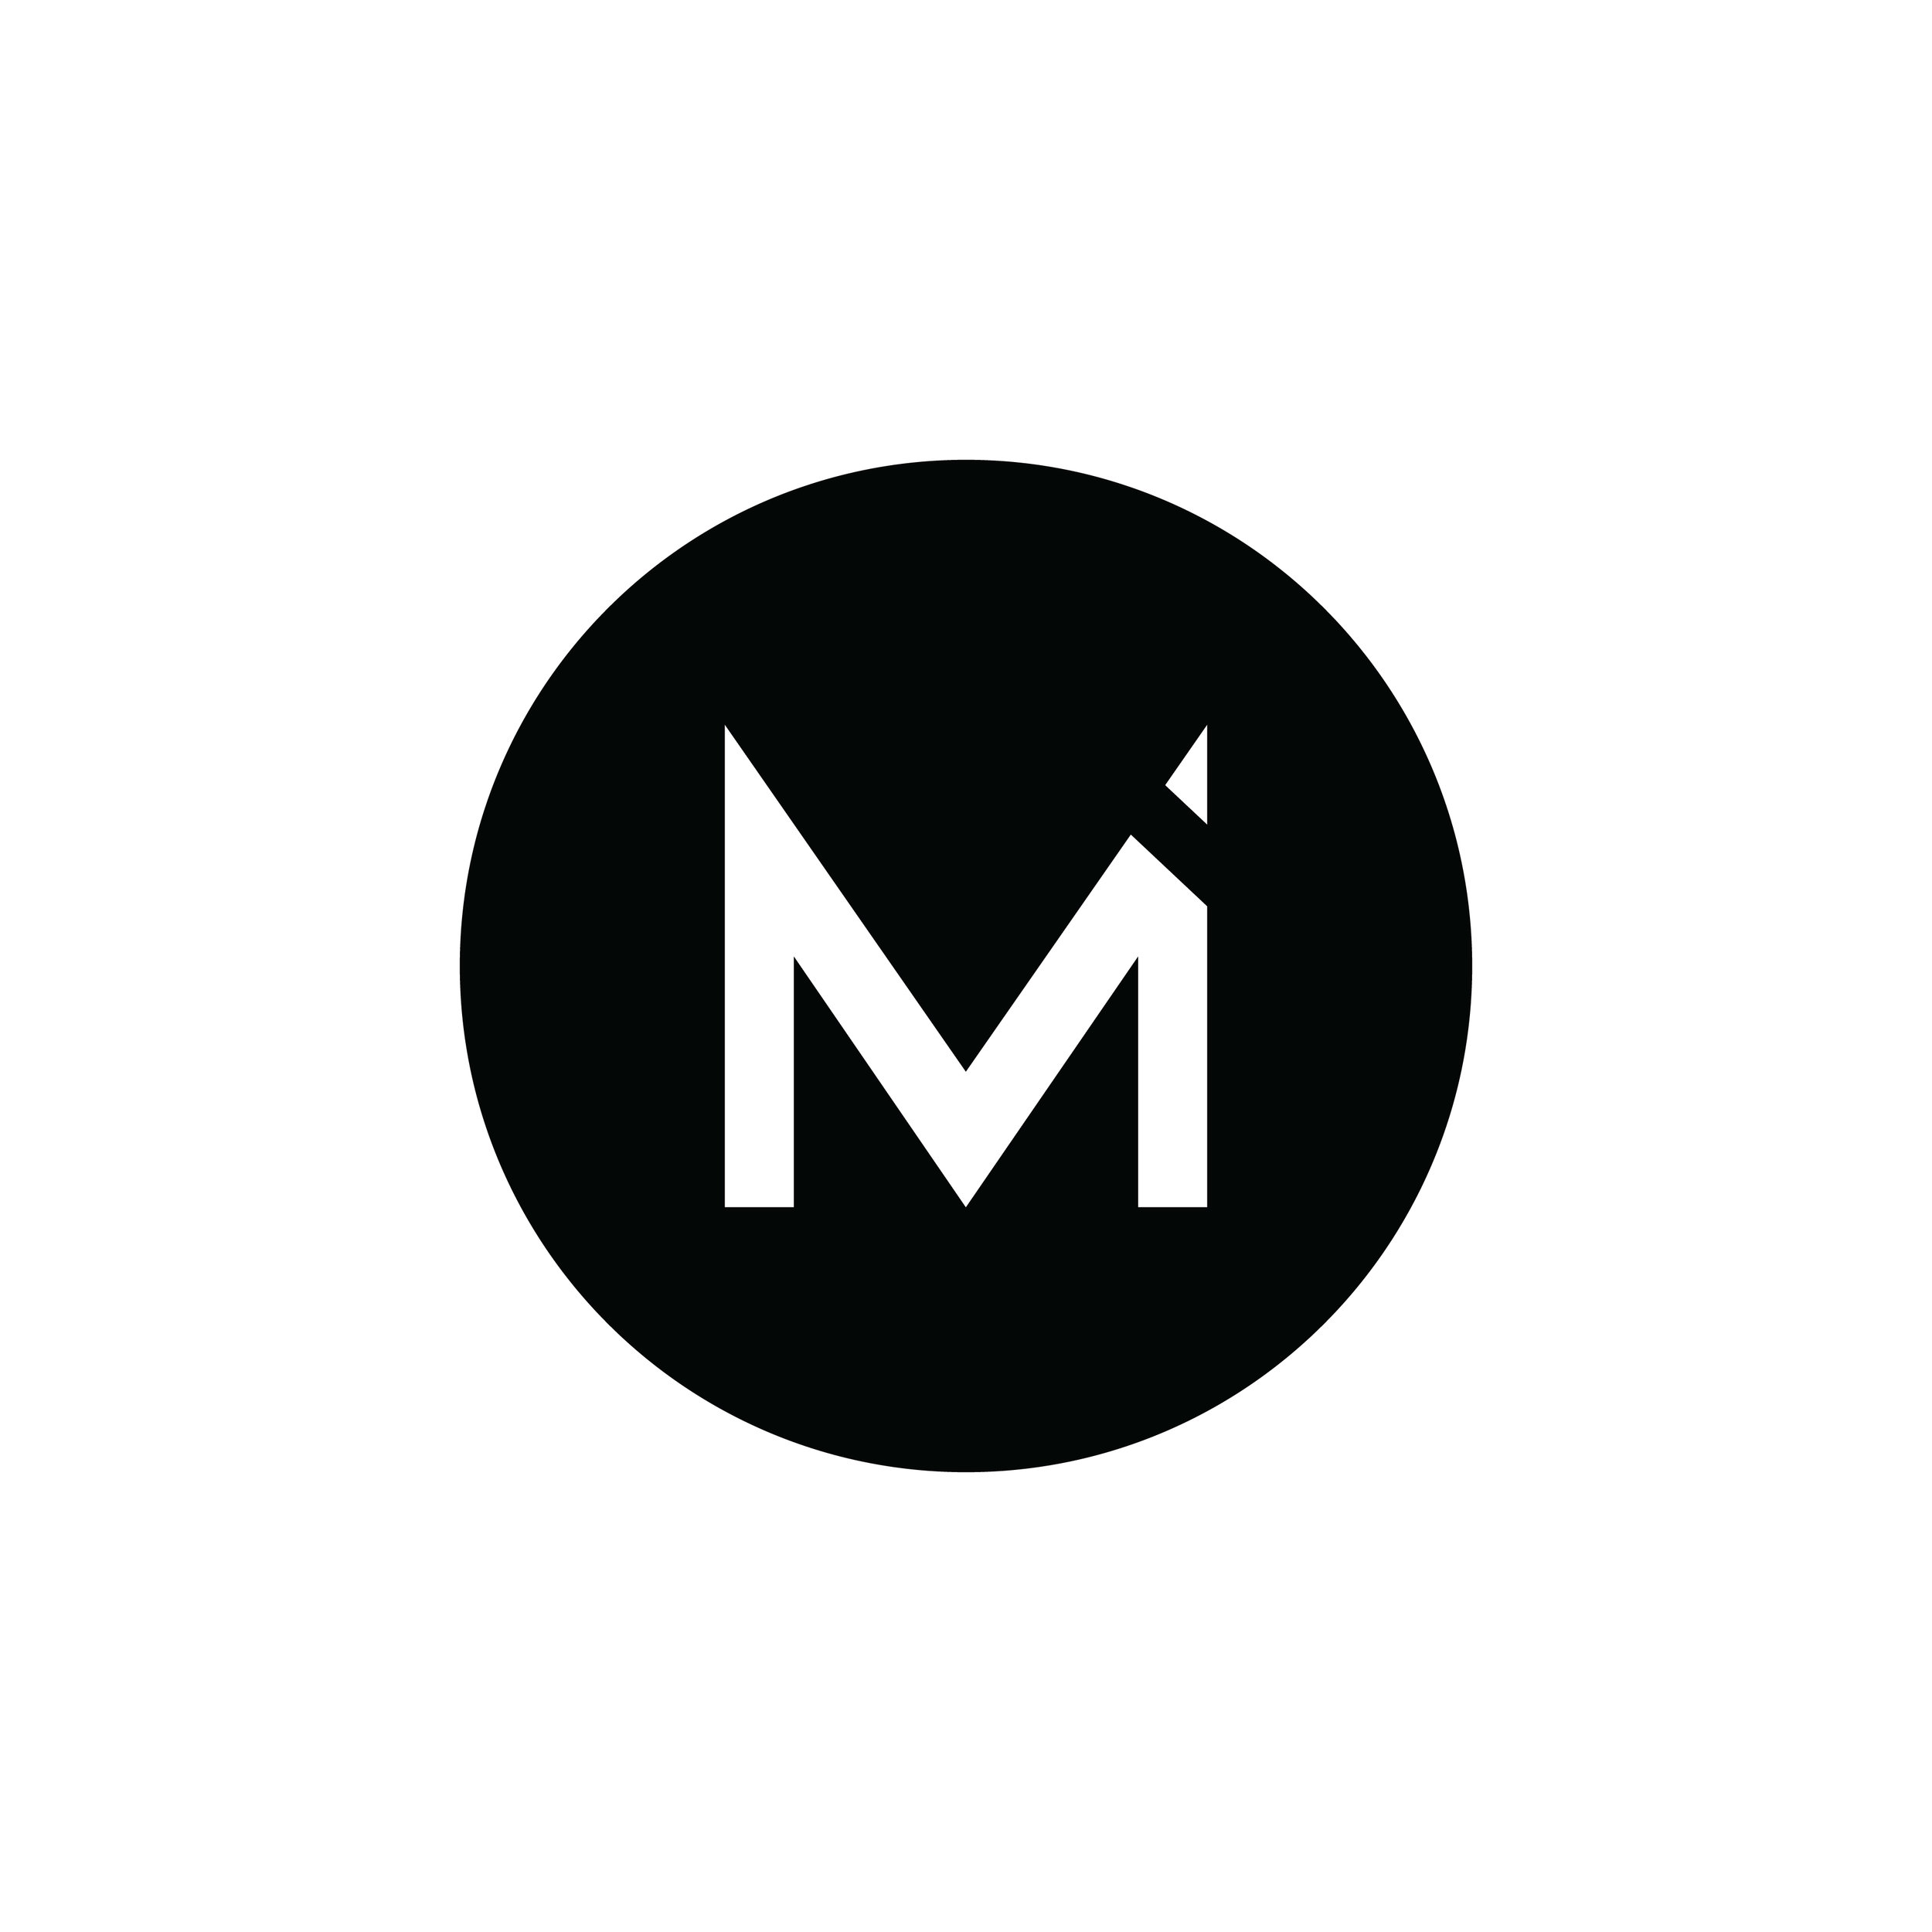 Mia-Interiors-Big-M-Submark-BW.jpg